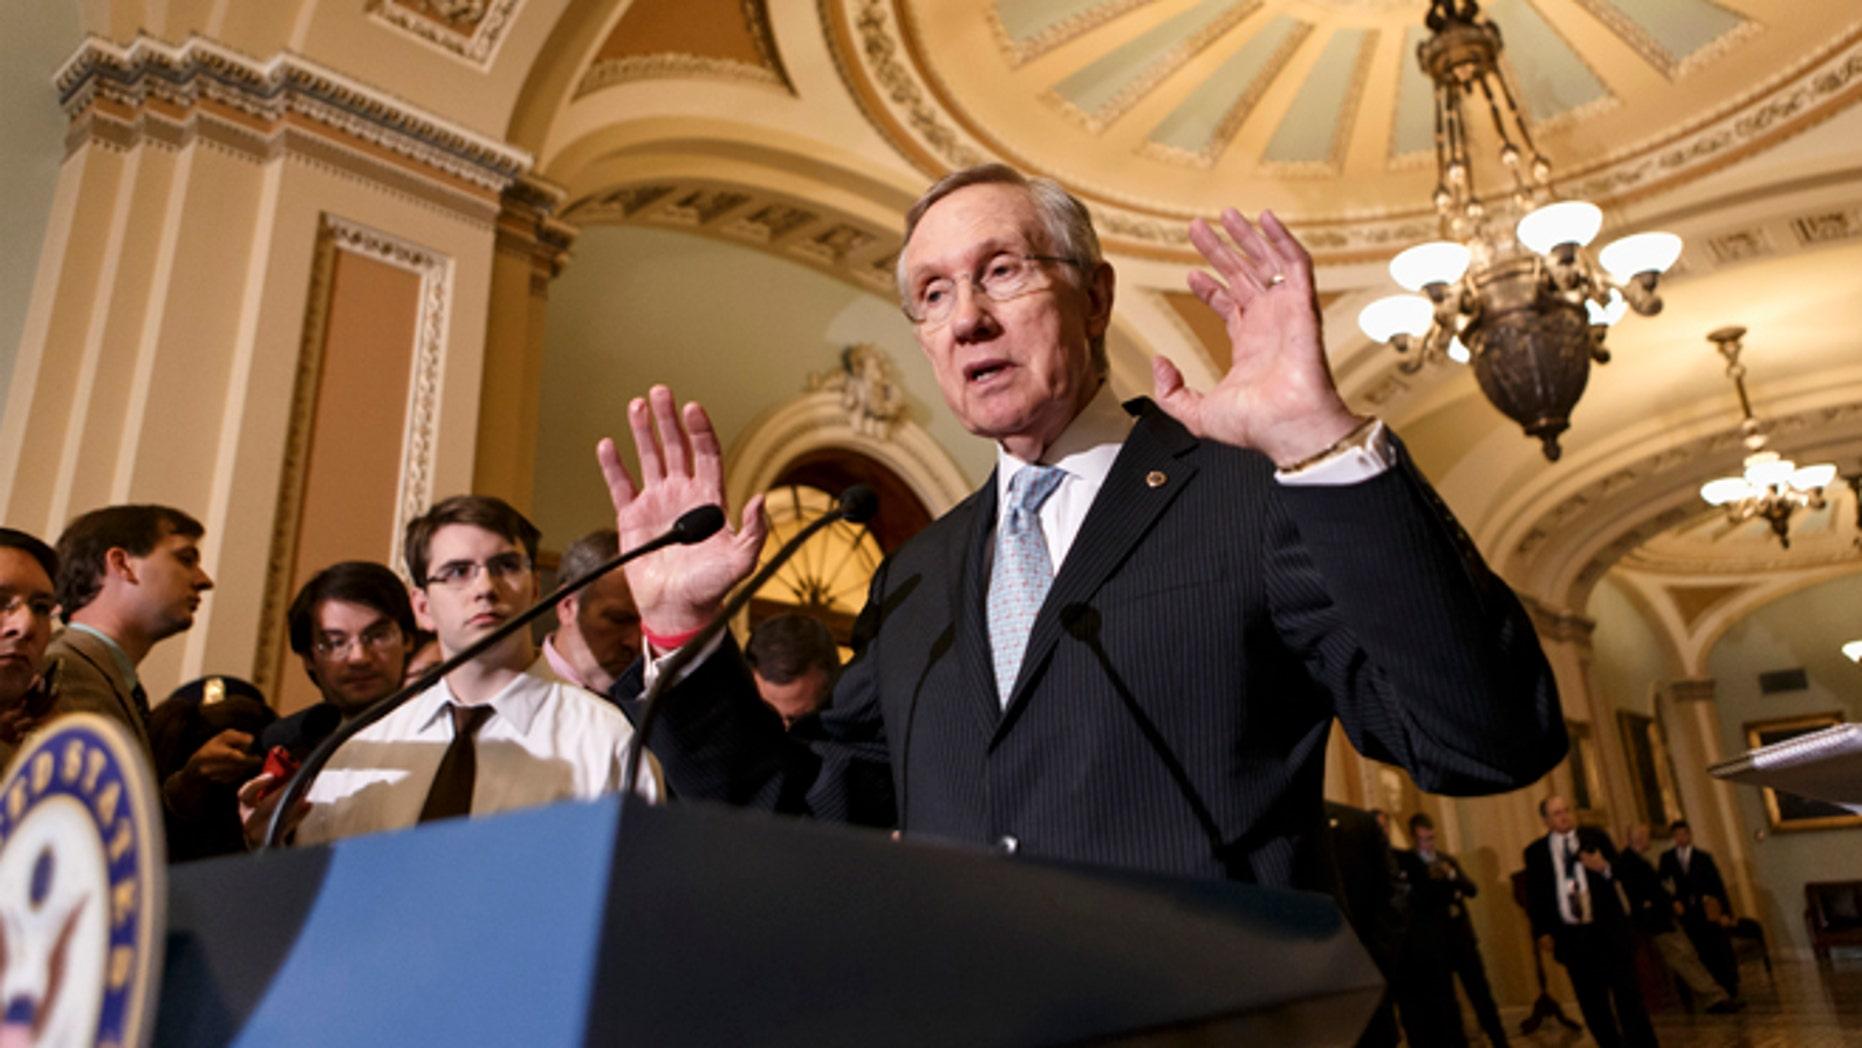 Sept. 24, 2013: Senate Majority Leader Harry Reid talks to reporters just off the Senate floor in Washington.